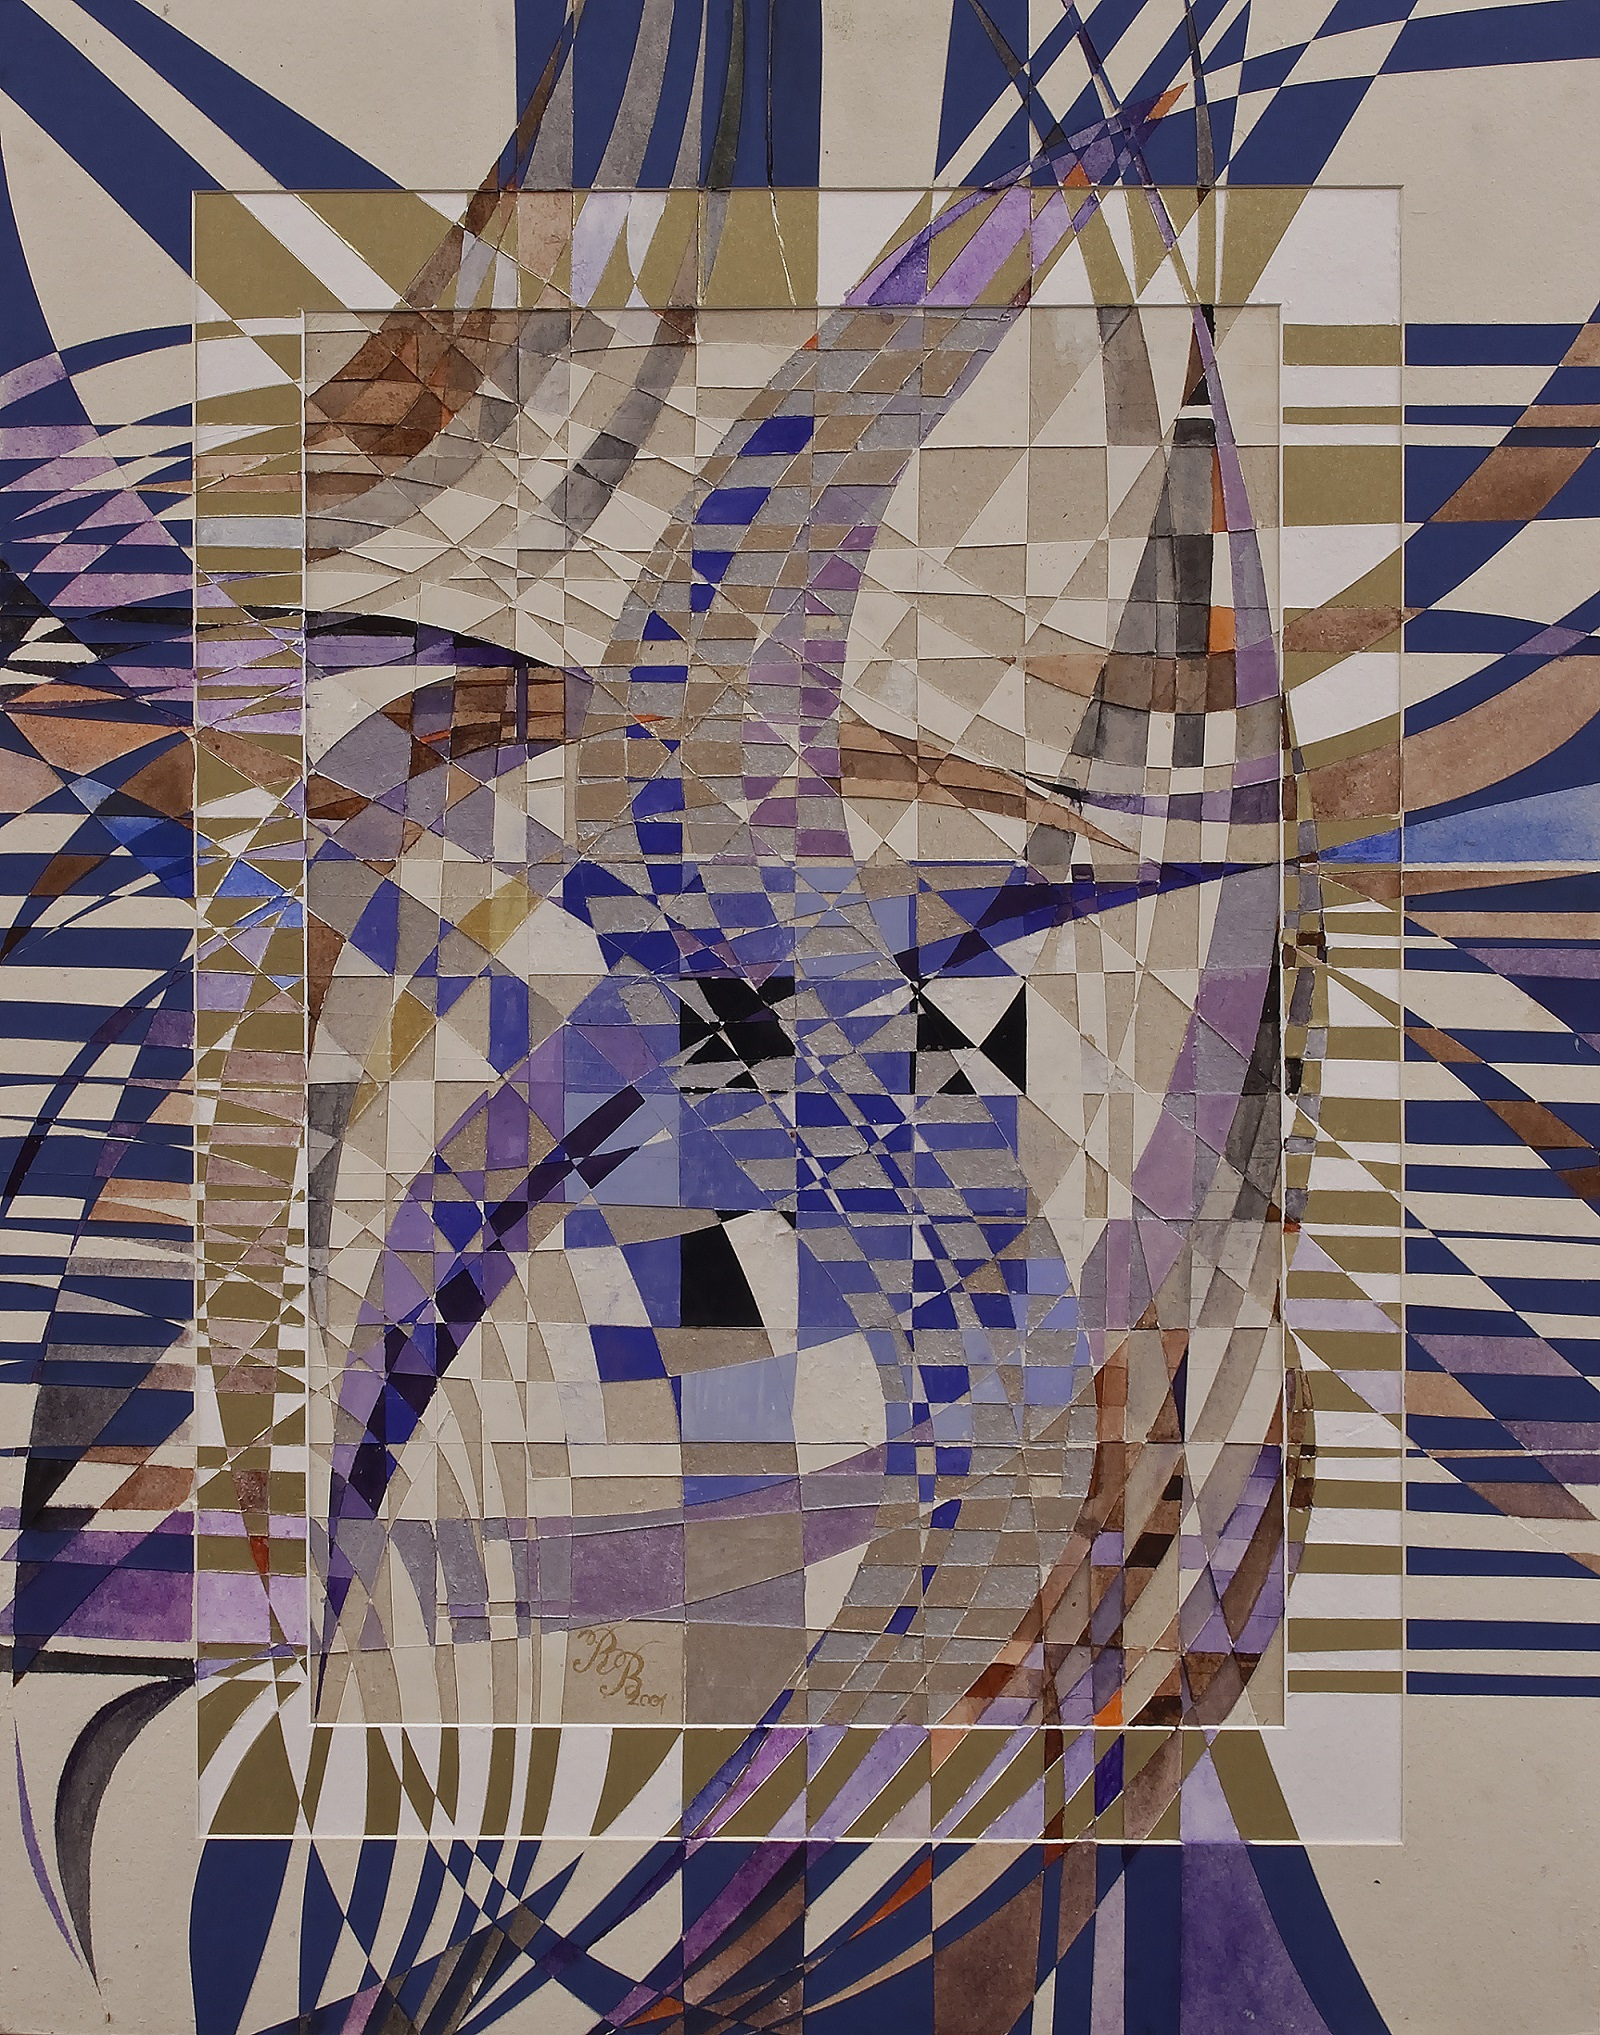 """Cage for Birds"" Rumyanka Bozhkova Drawing Engraving on Multilayer Cardboard"